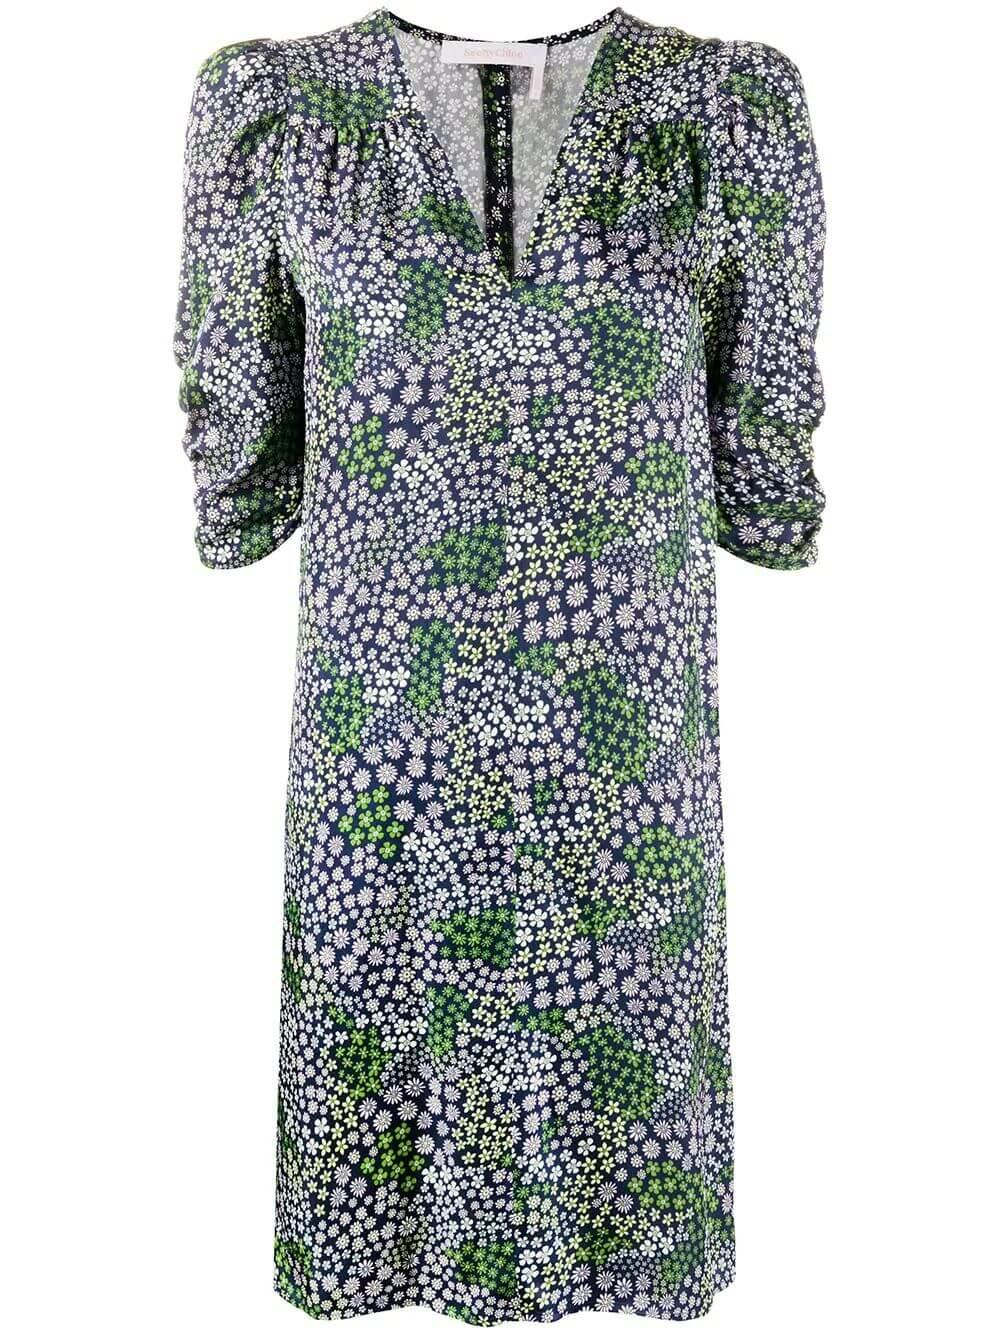 Summer Floral Twill Half Sleeve Dress Item # CHS20URO20032